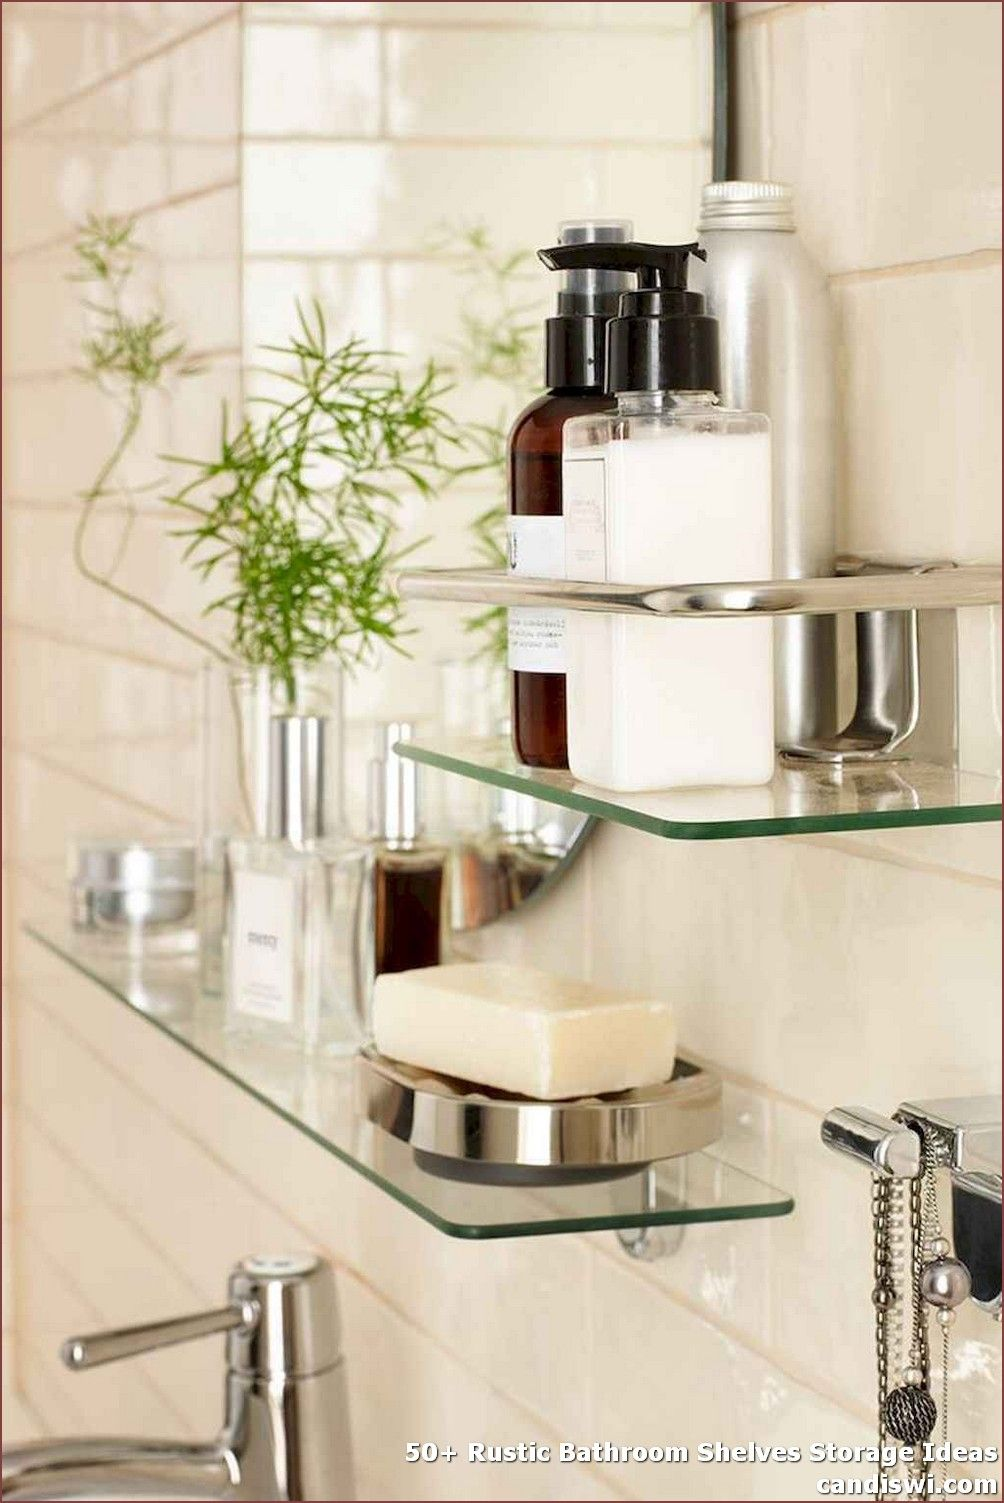 50 Rustic Bathroom Shelves Storage Ideas Including A Floating Shelf Above The Bathroom Is A Straightf Glass Bathroom Shelves Shower Shelves Glass Bathroom